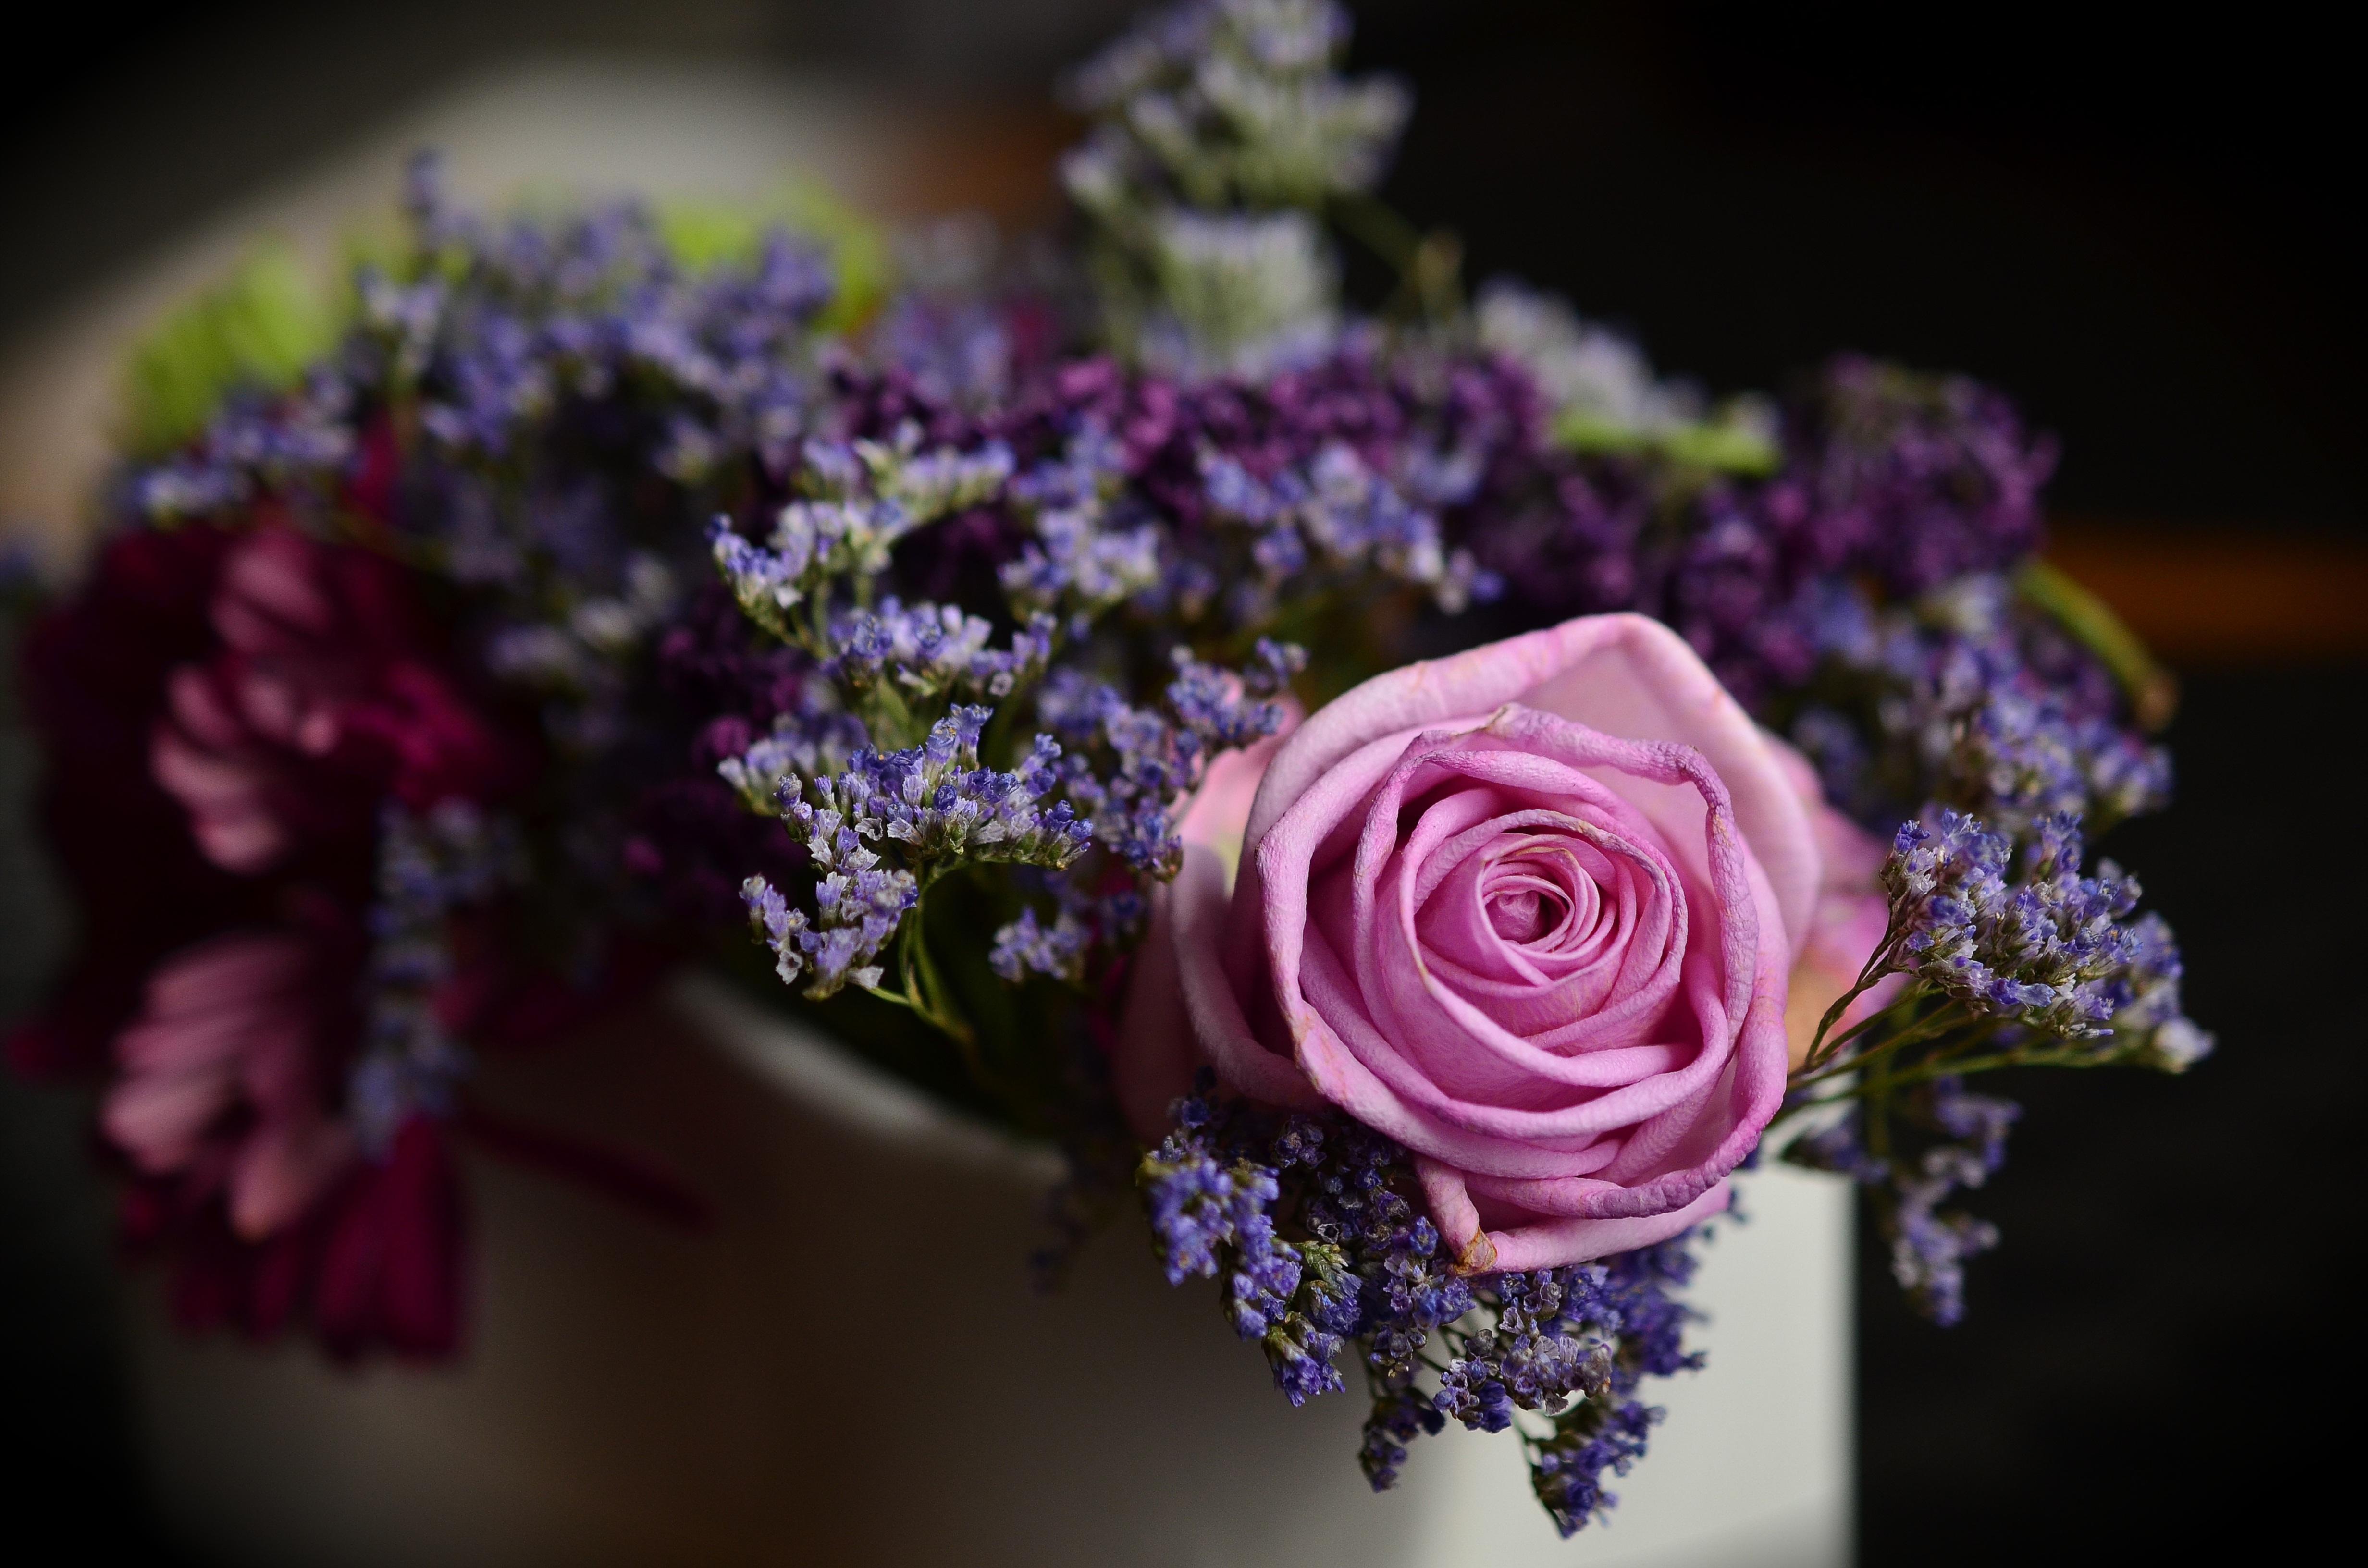 Free Images : blossom, purple, petal, rose, pink, flora ...